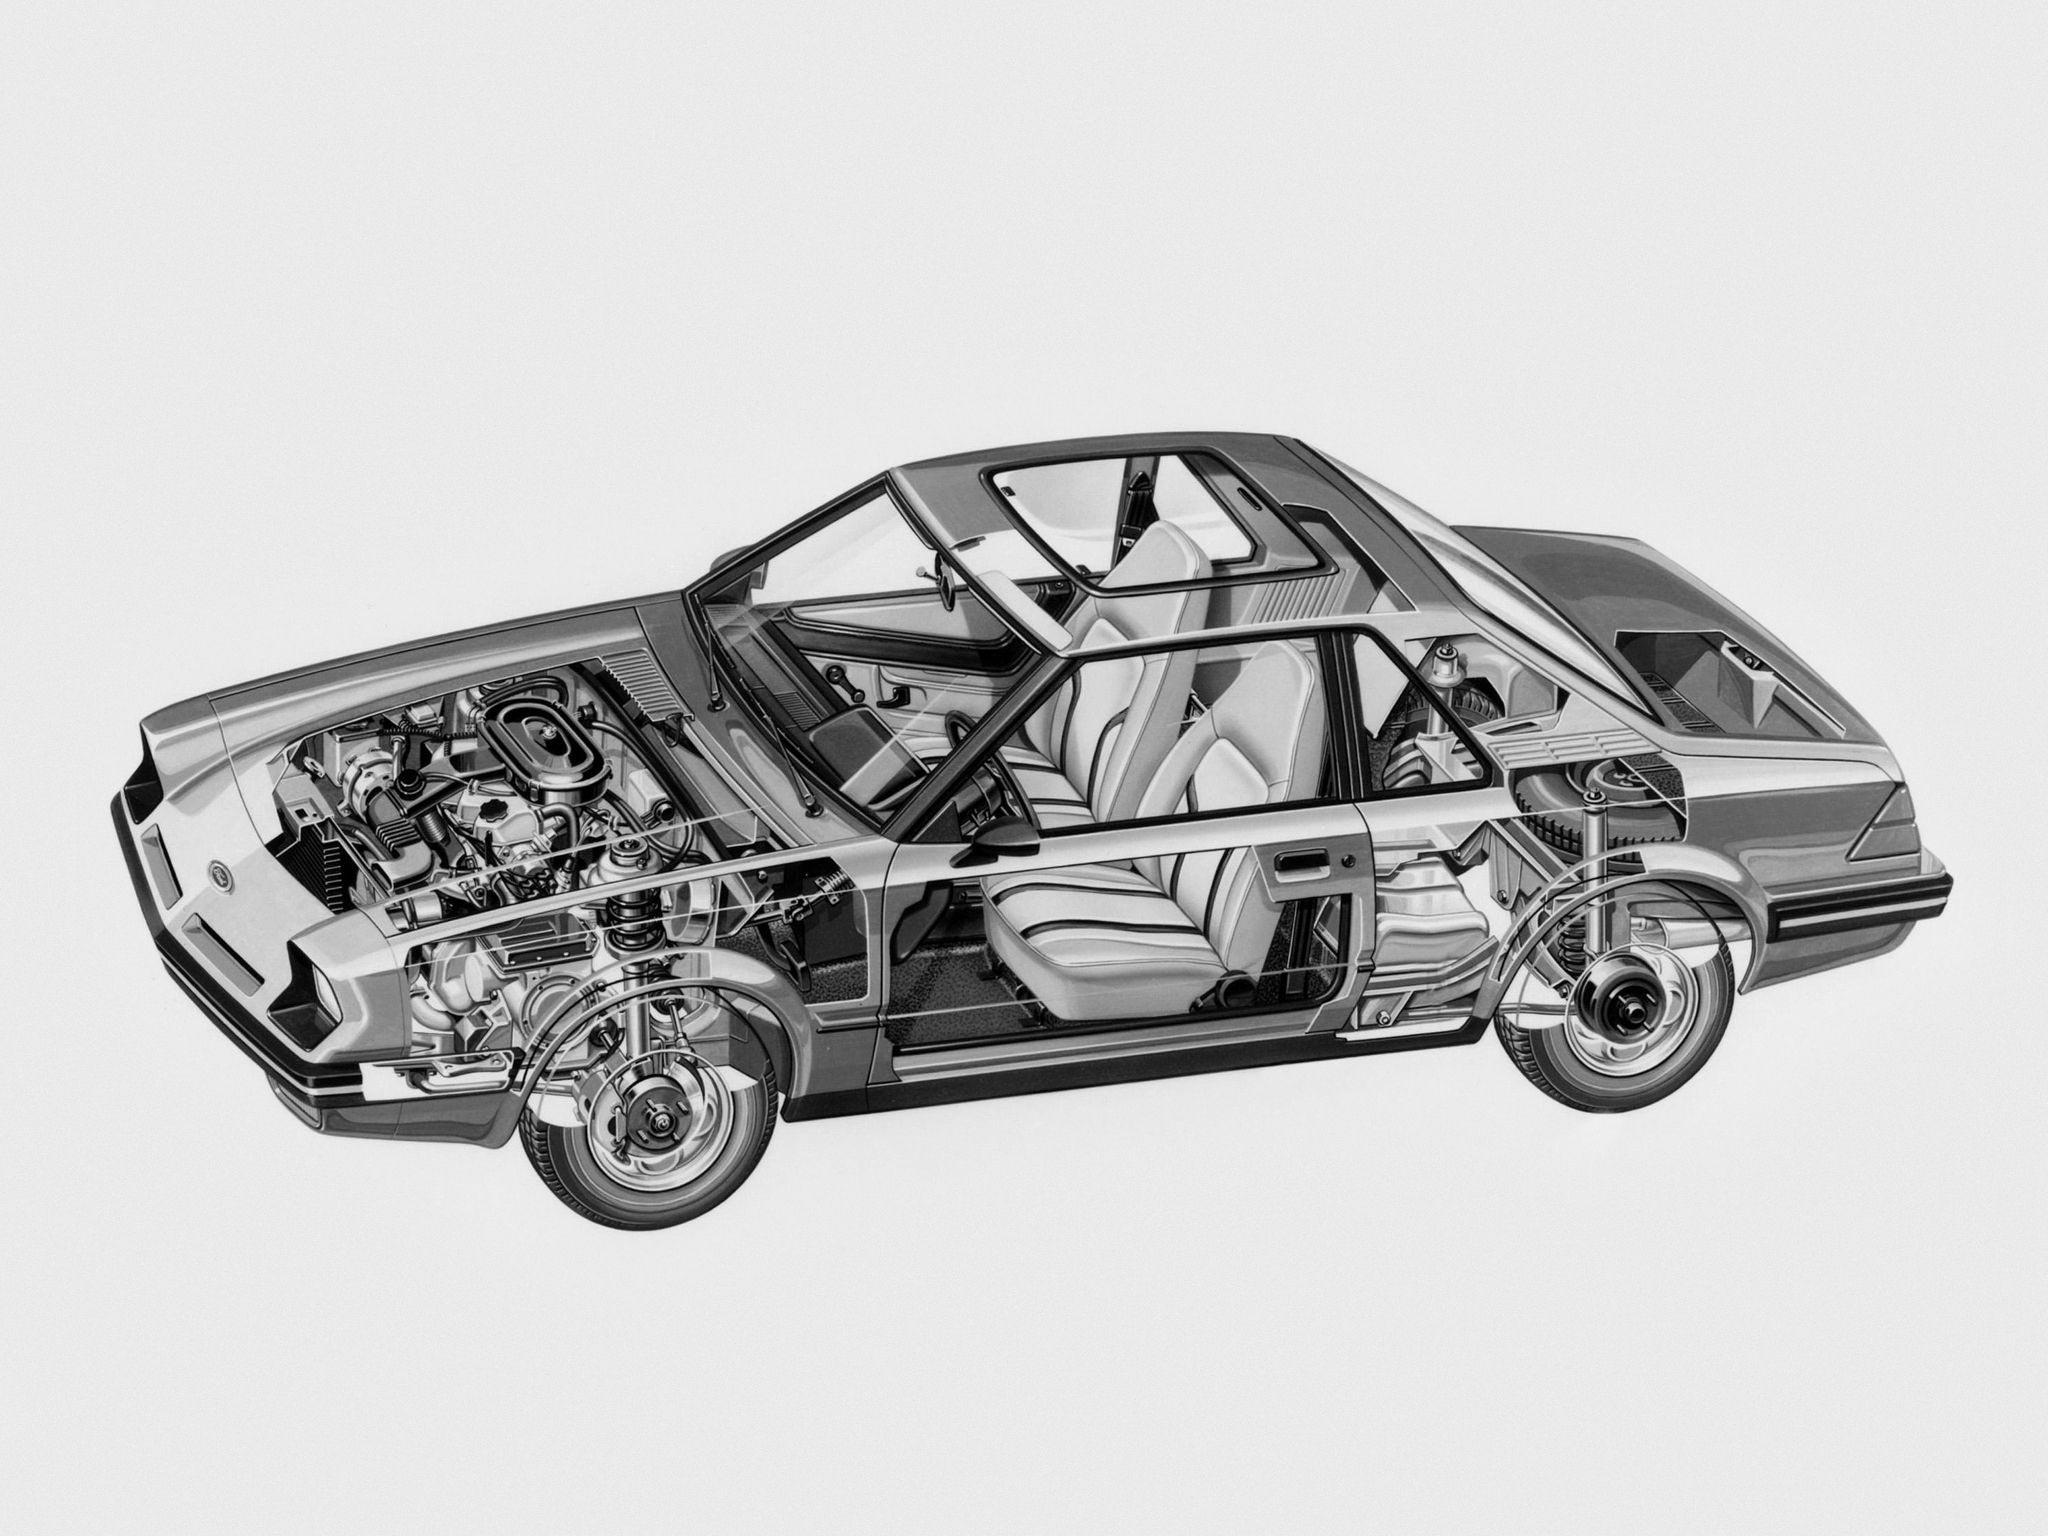 Ford EXP cutaway drawing